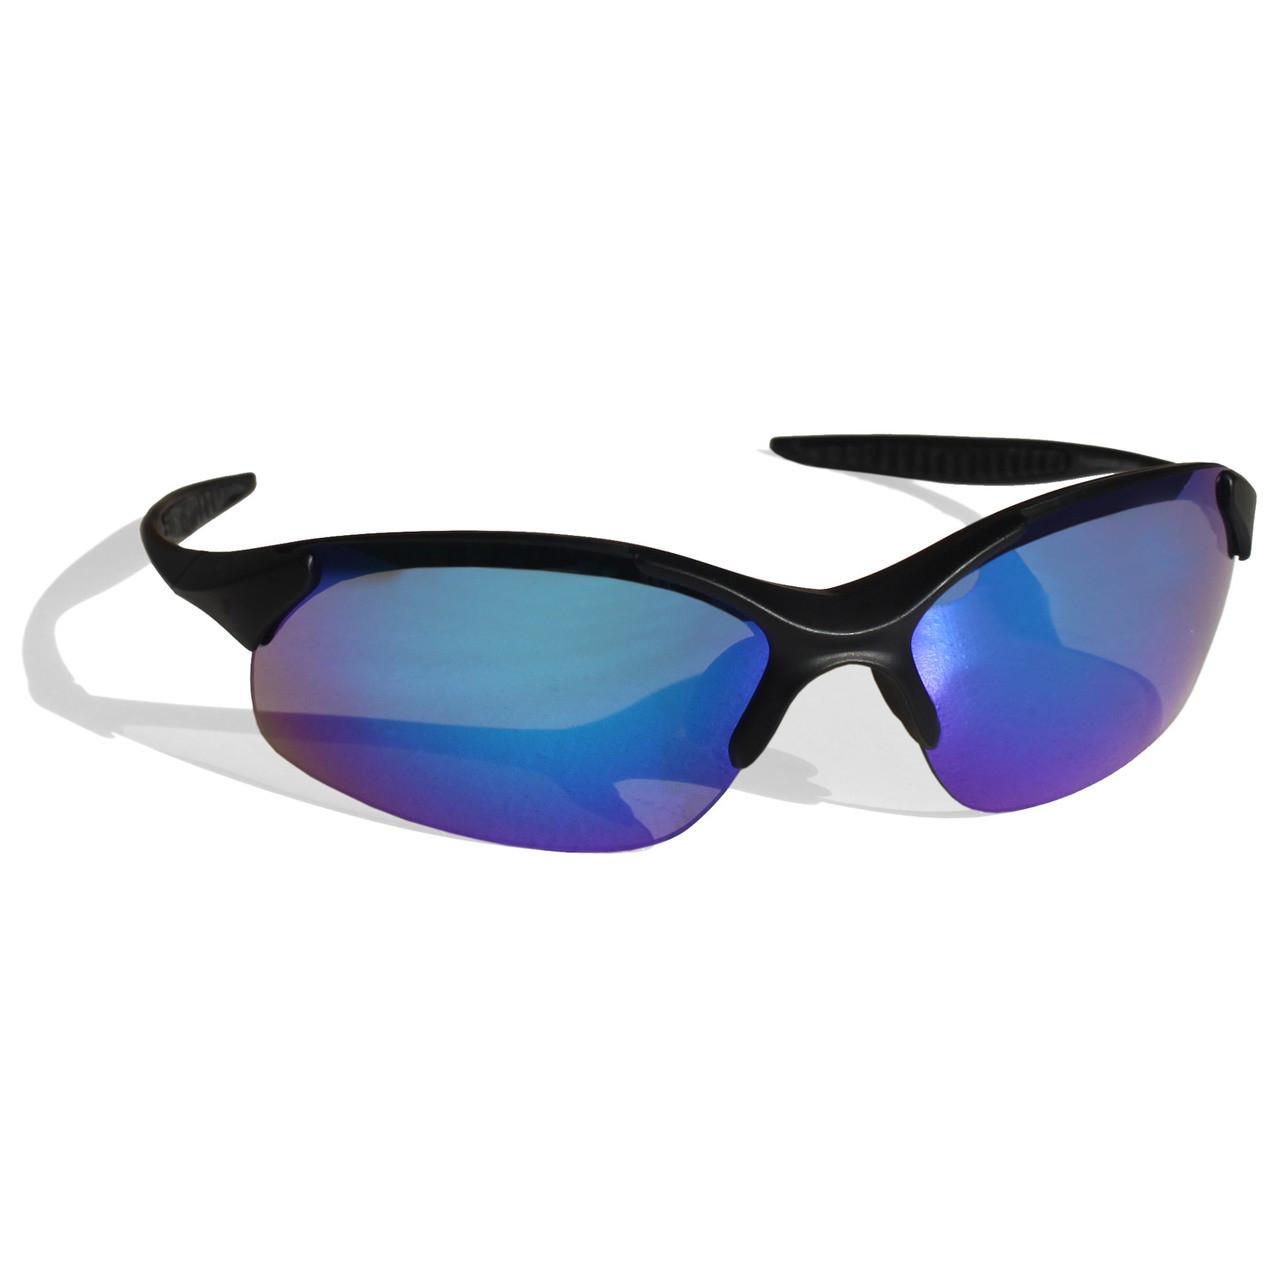 9d5283912823 Tanel 360 T1 Baseball/Softball Sunglasses - Tanel 360